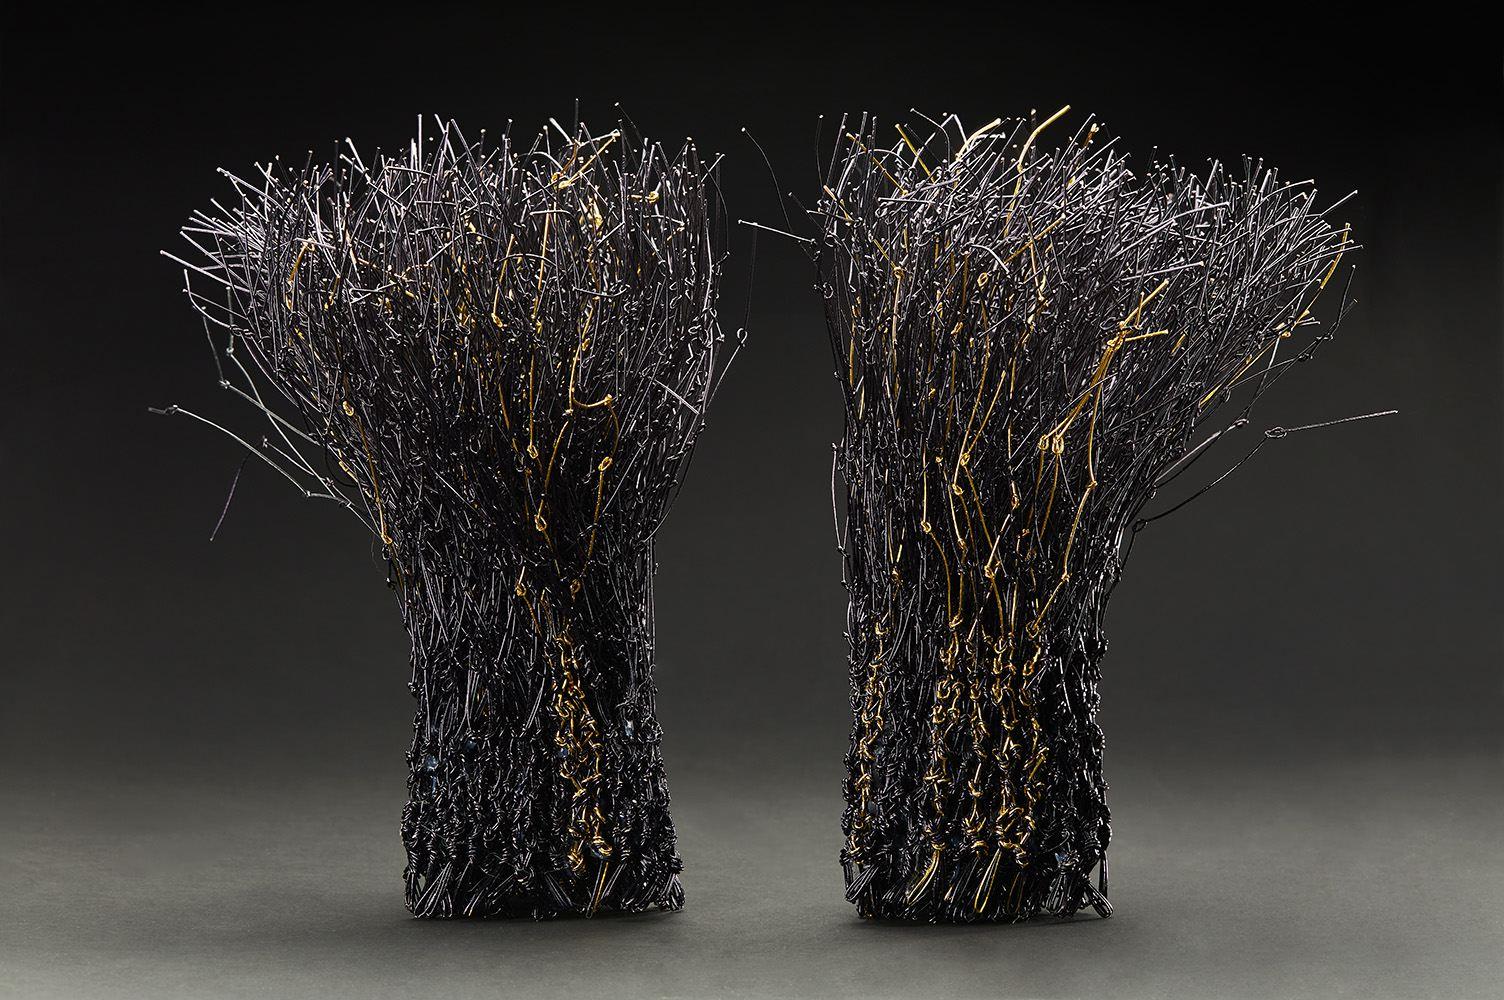 Kakuko Ishii  Musubu  , 2016 Knotted paper strings a. 11 x 6 x 6 inches b. 11 x 6 x 6 inches KIS 2